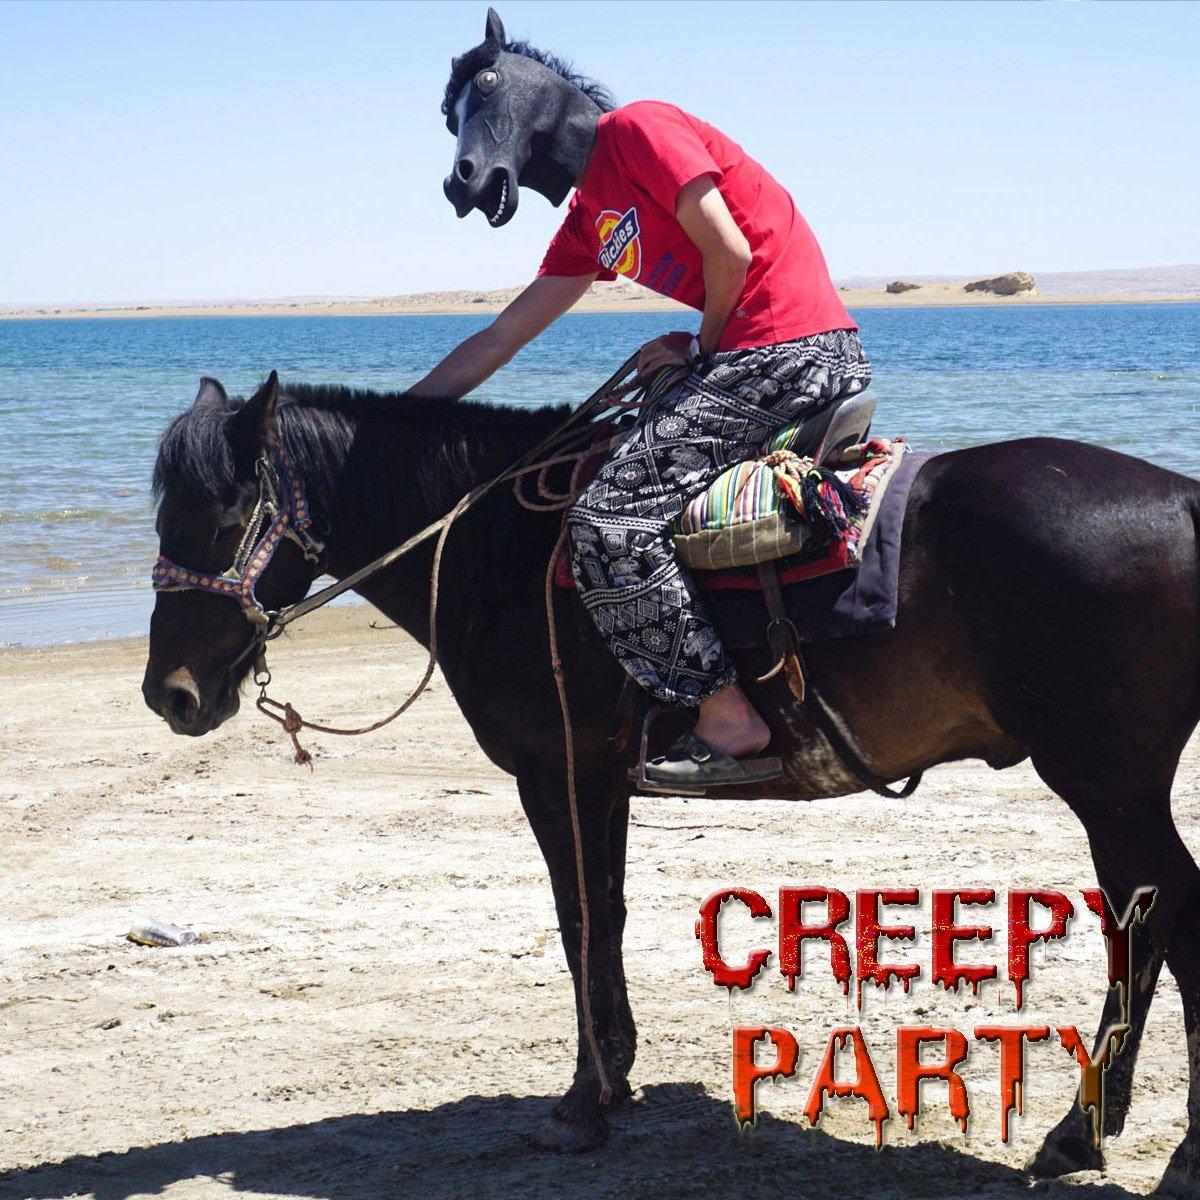 Amazon.com: CreepyParty Deluxe Novelty Halloween Costume Party ...